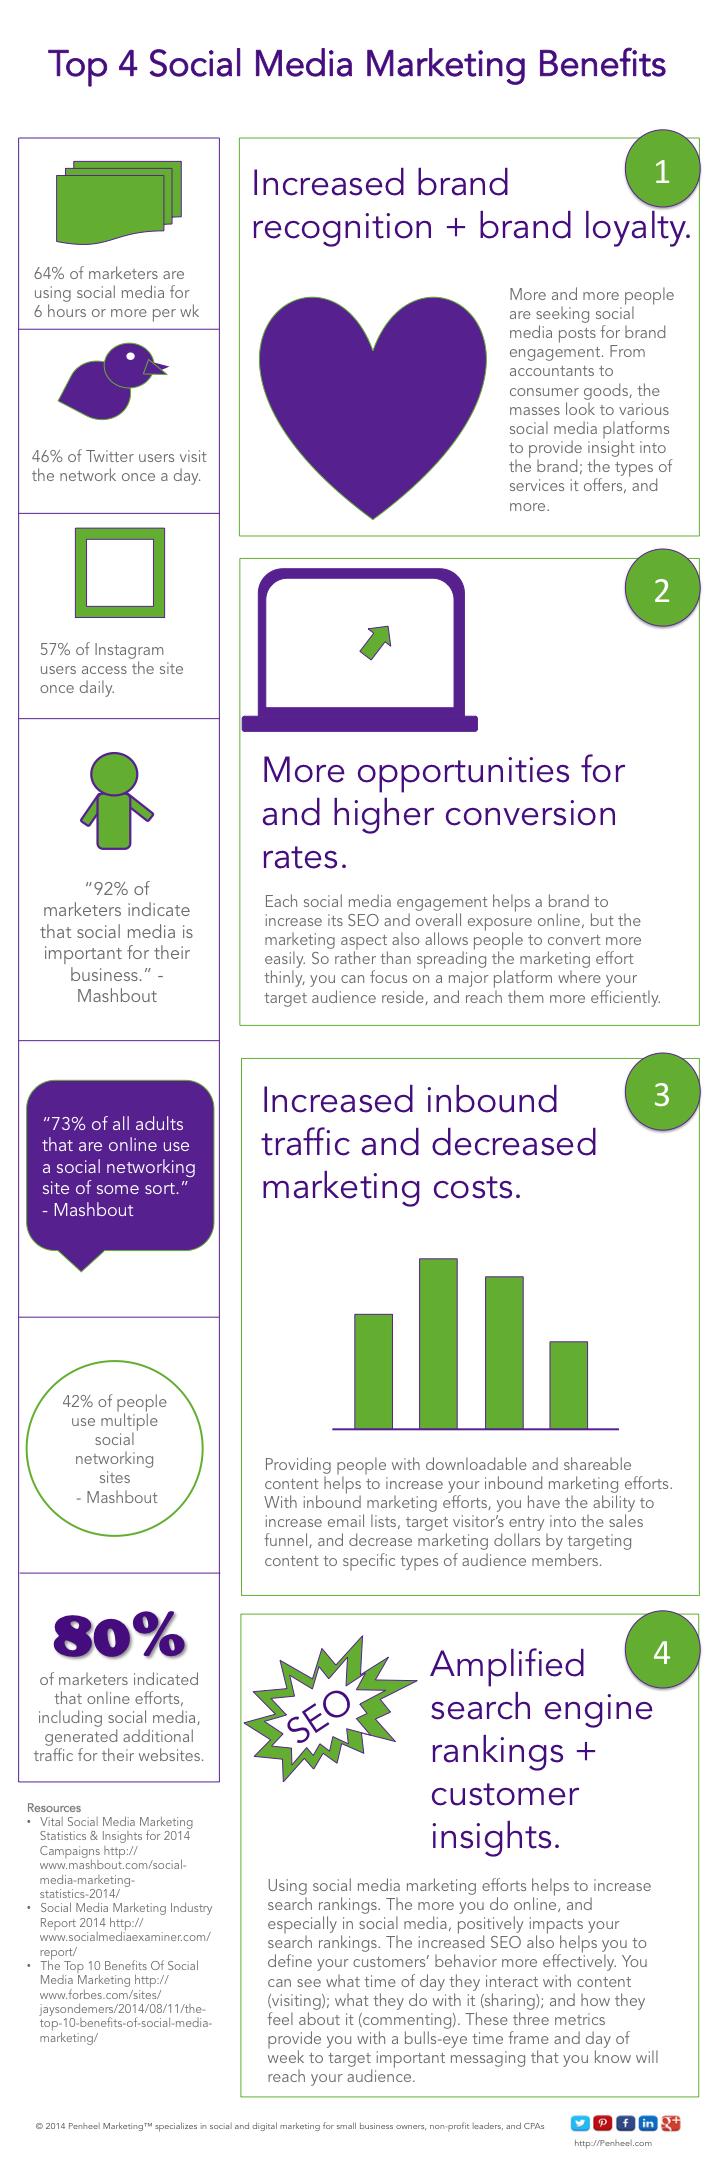 Top 4 Social Media Marketing Benefits Infographic